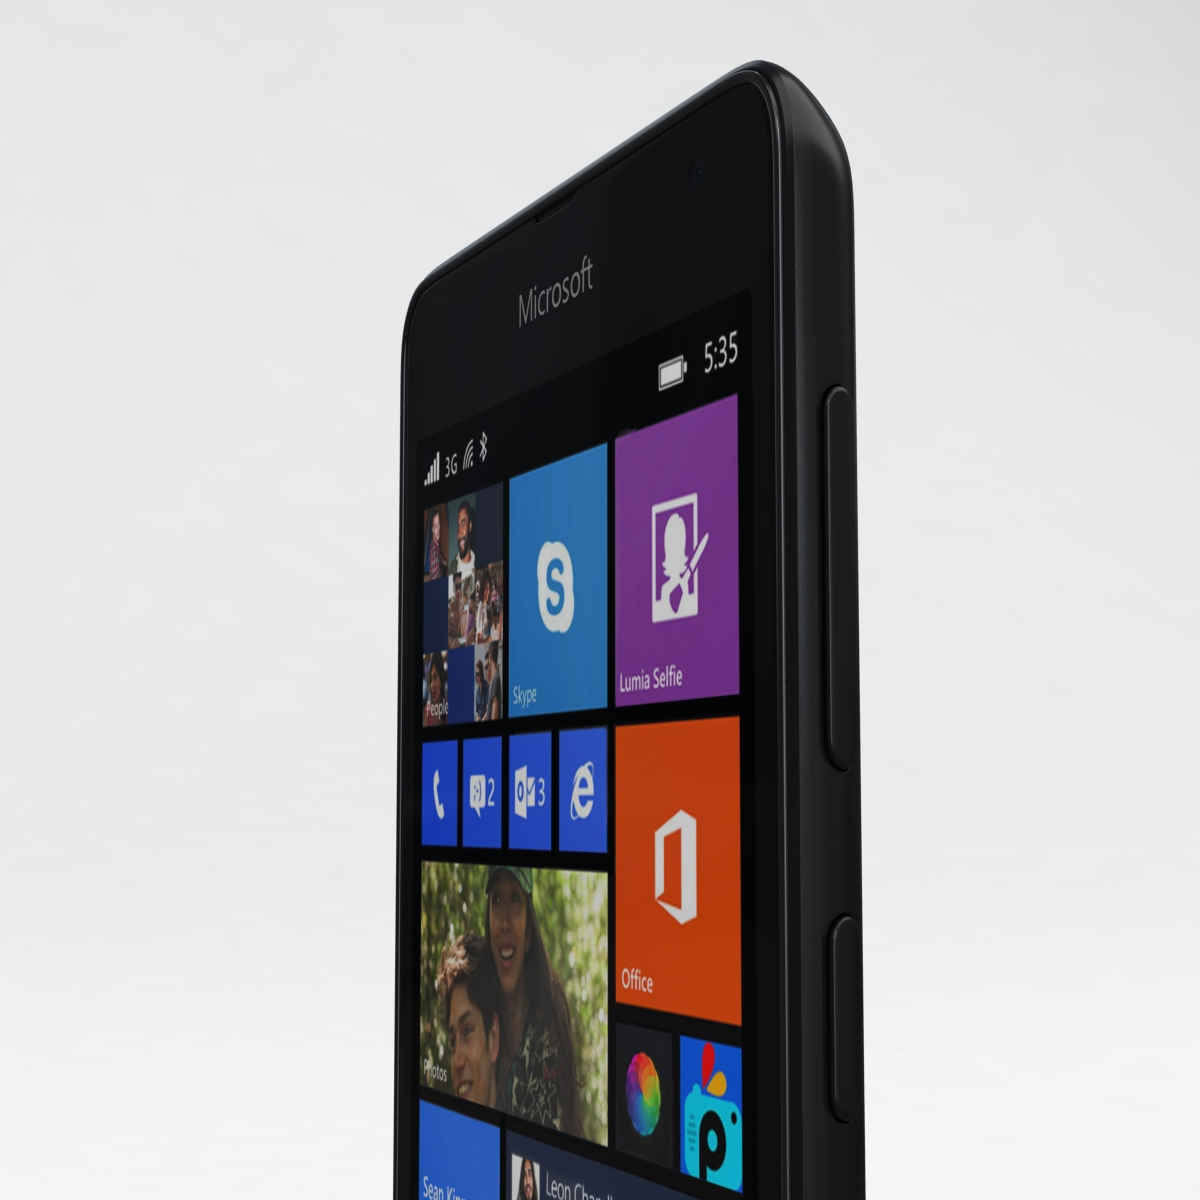 microsoft lumia 535 and dual sim black 3d model 3ds max fbx c4d obj 204360